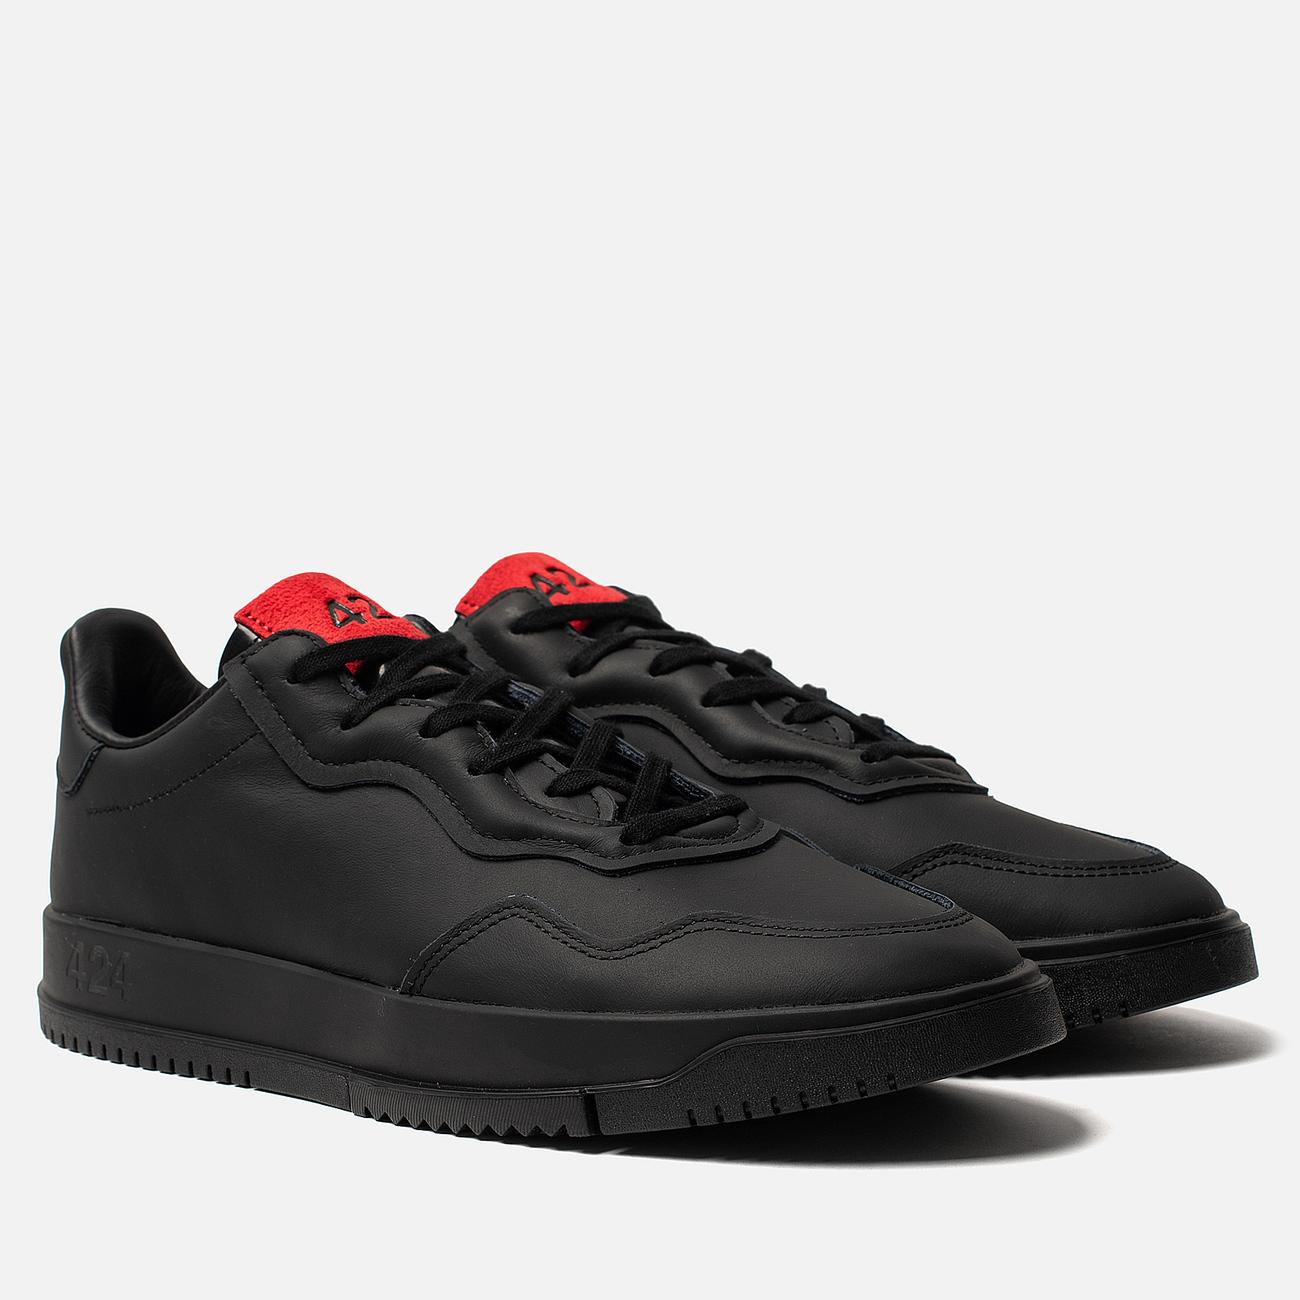 Мужские кроссовки adidas Originals x 424 Supercourt Premiere Black/Black/Scarlet